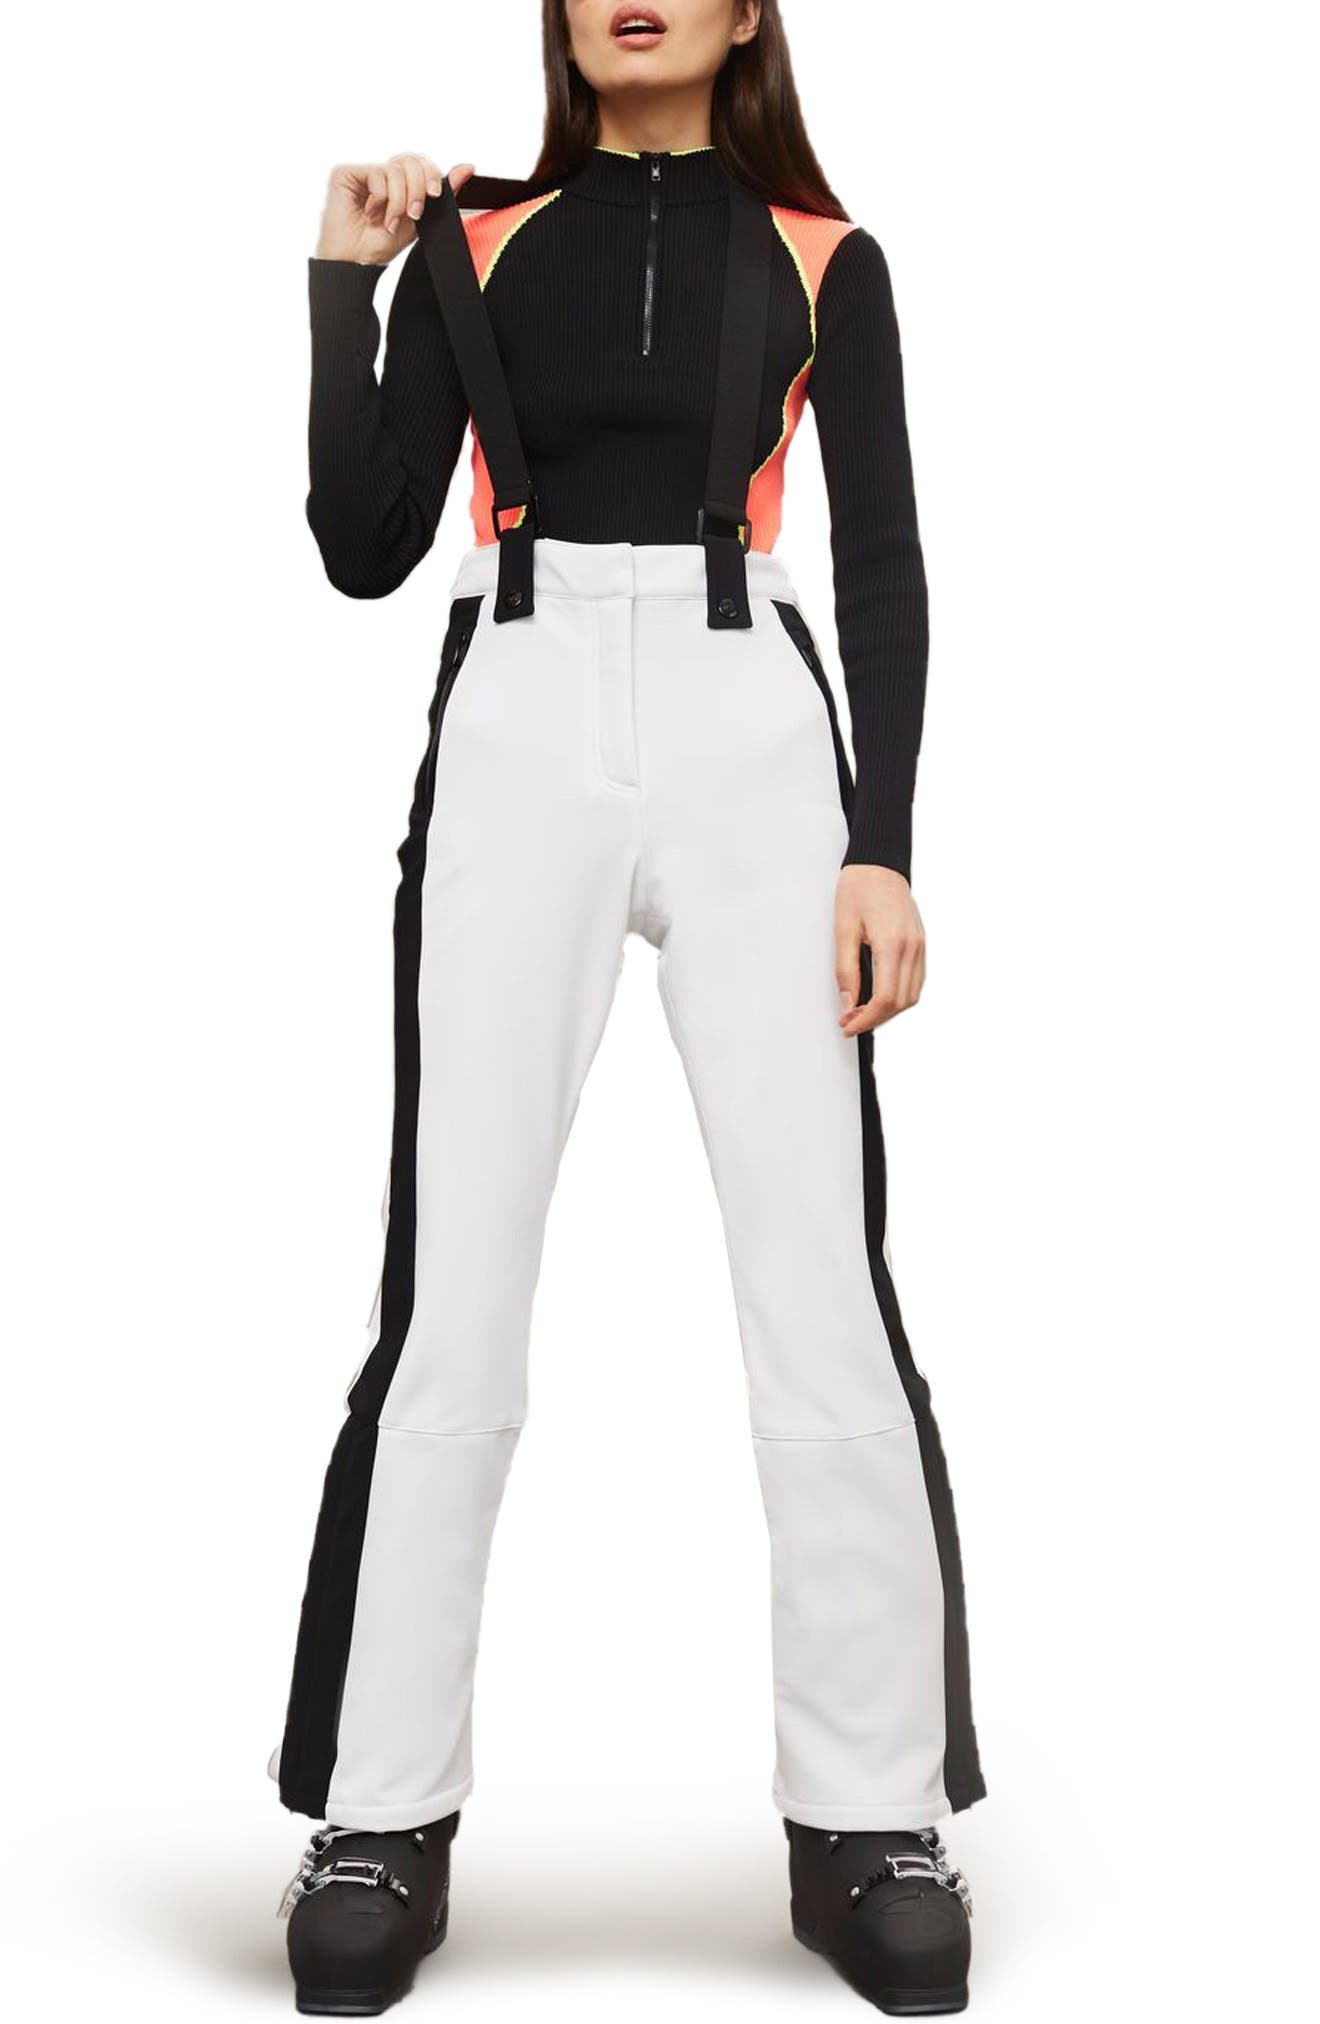 Topshop SNO Bullet Suspender Ski Pants